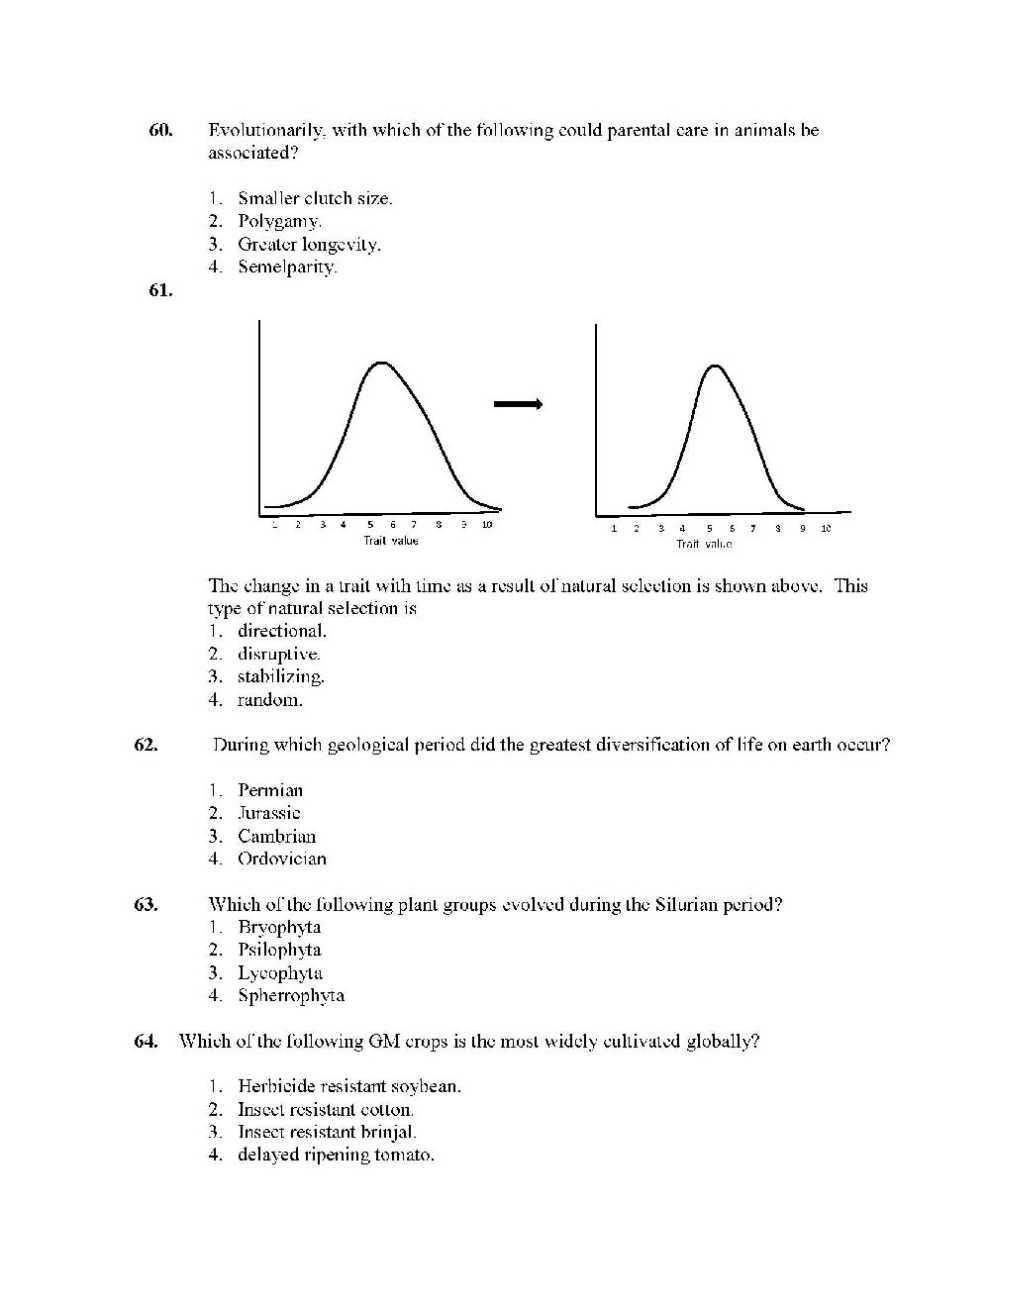 csir net life science question paper december 2011 pdf